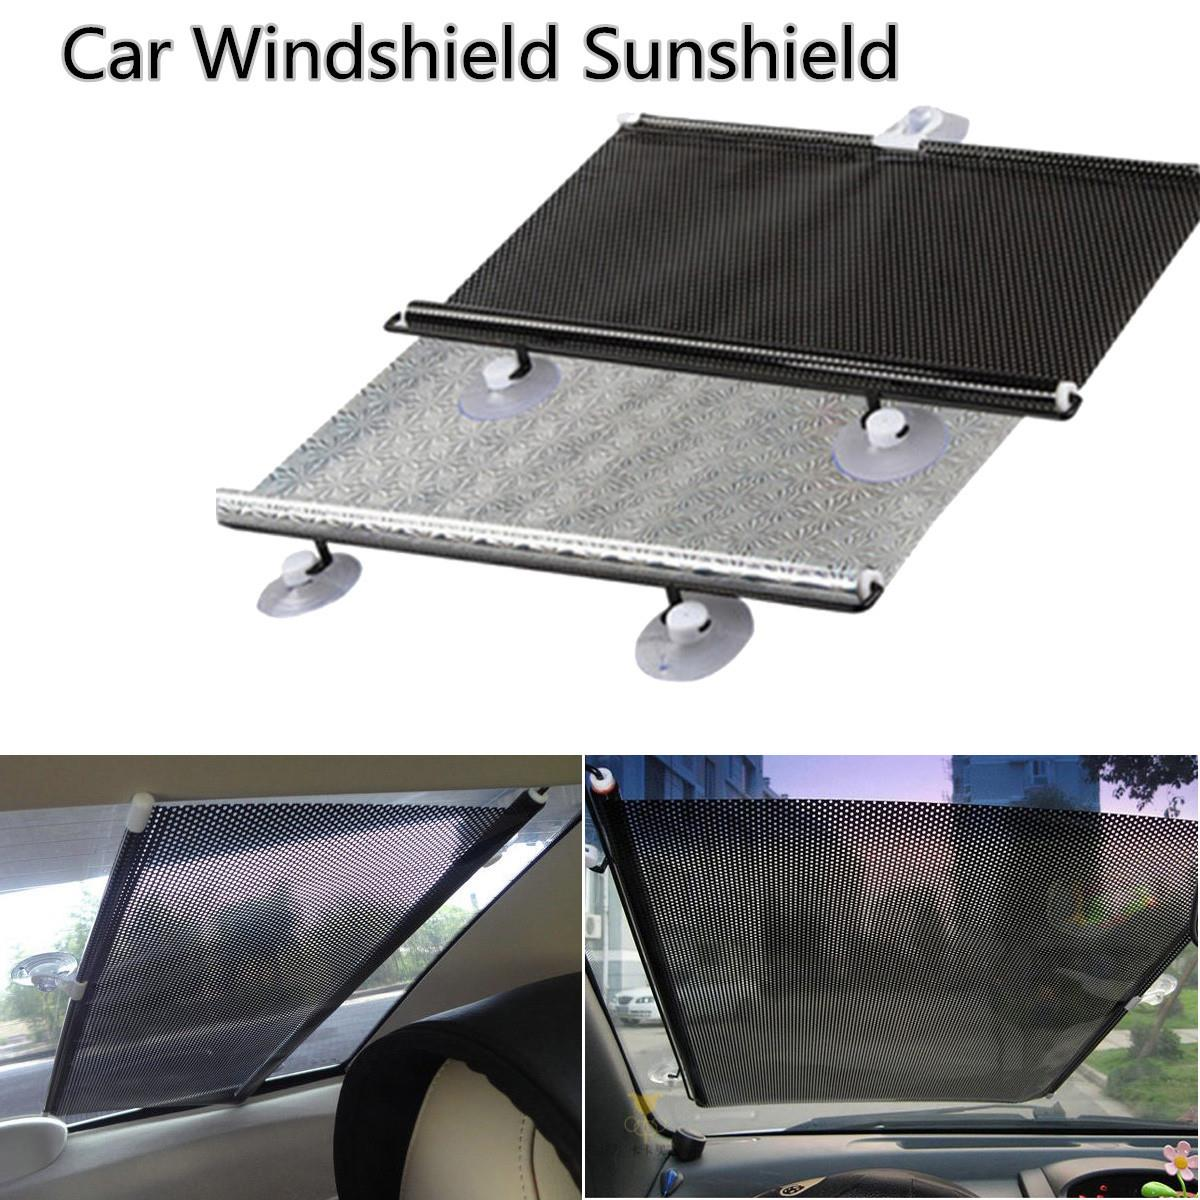 Tamaño grande persianas auto retractable car cortina ventana parabrisas visor Sol escudo frontal trasera Sol Sombras Shield exterior